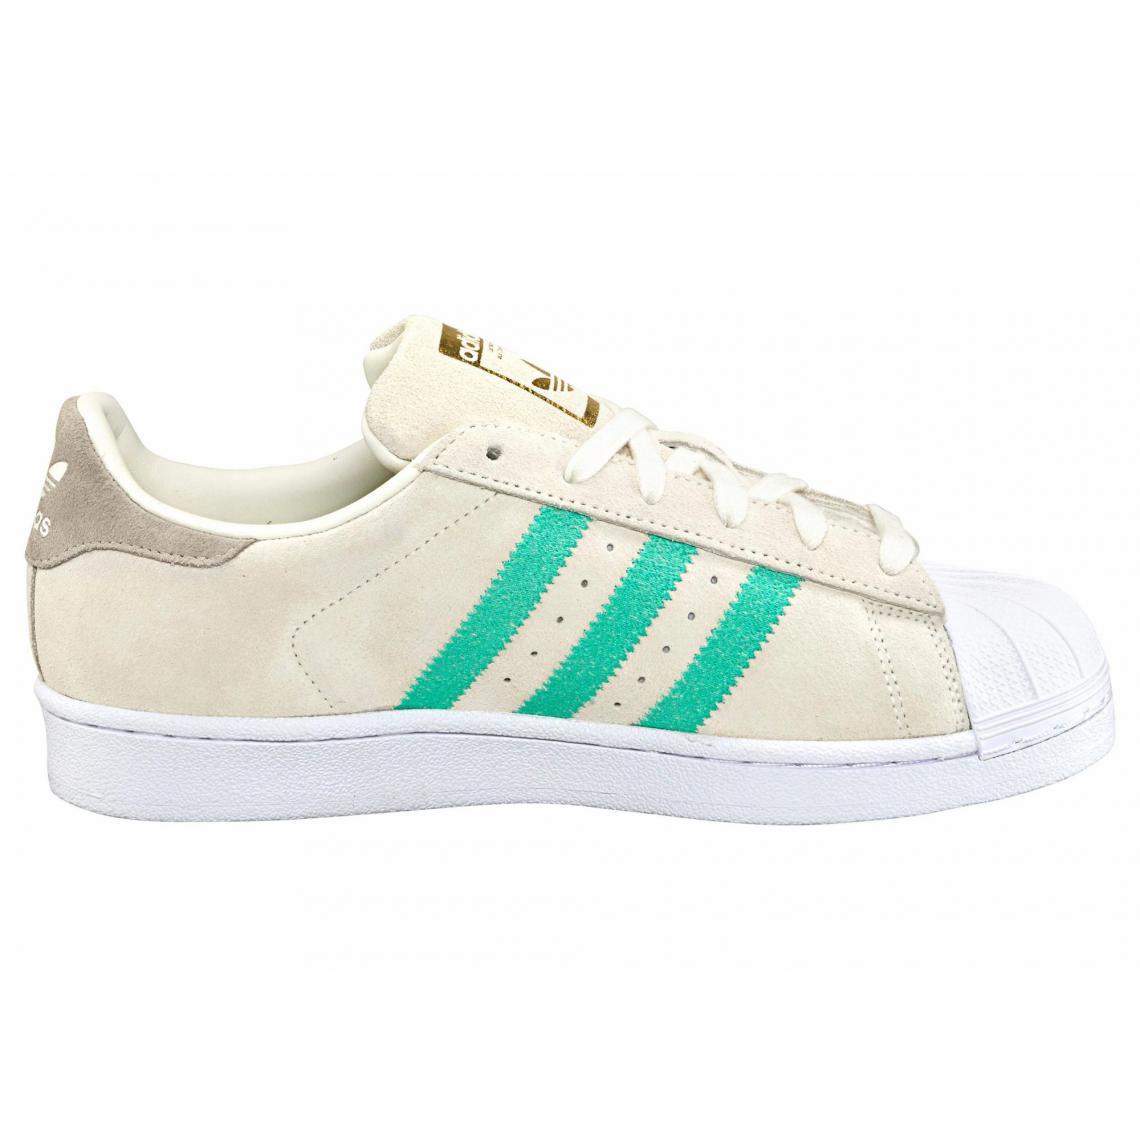 Chaussures de sport adidas Originals Sneaker